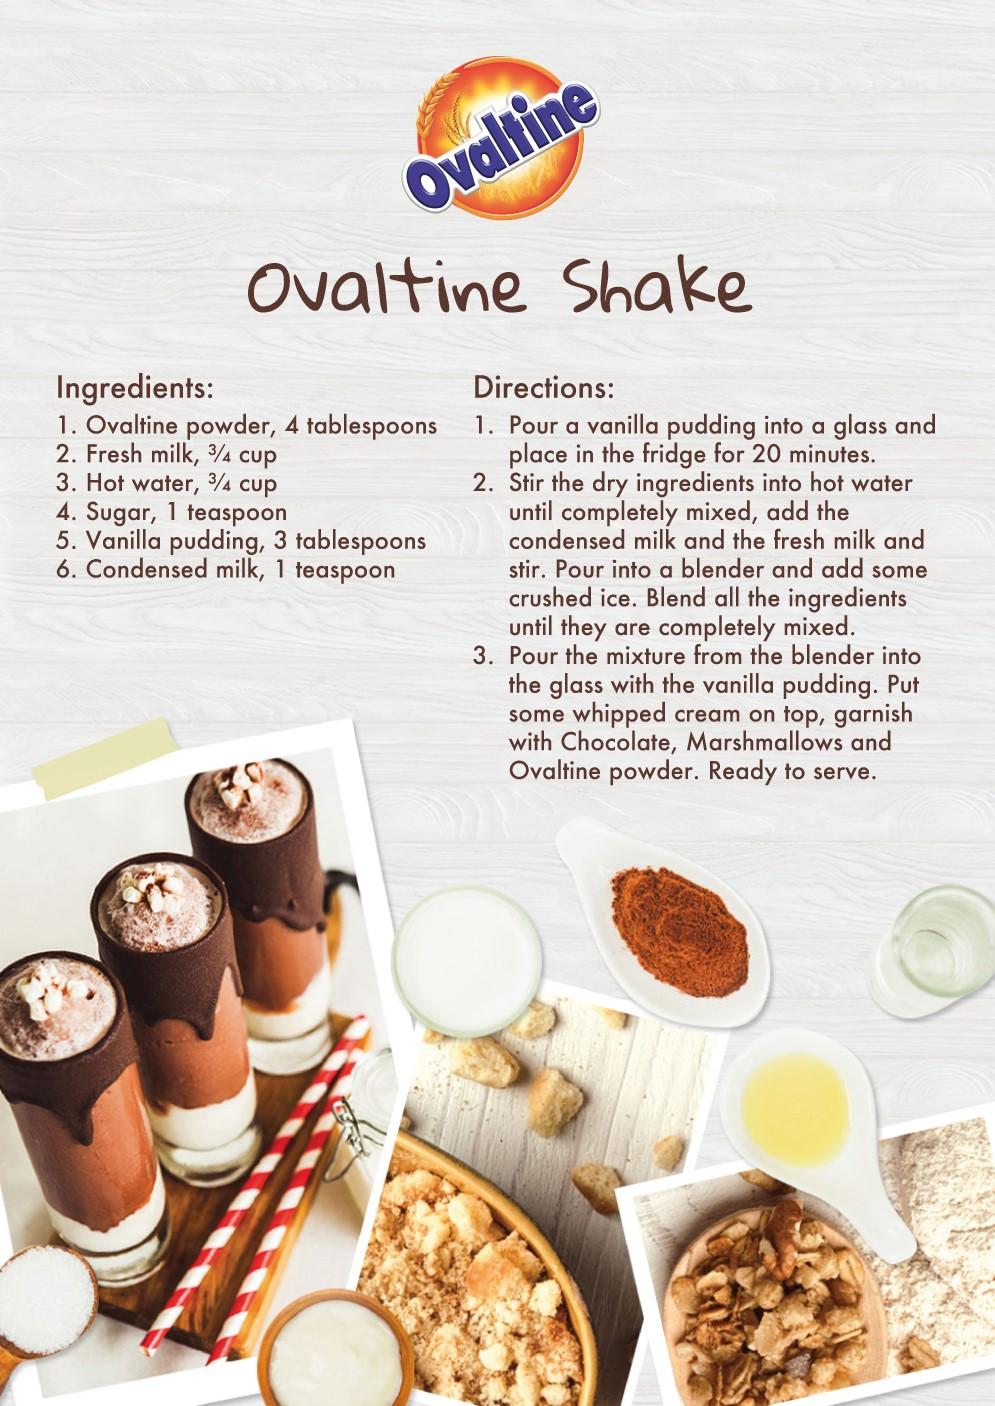 Ovaltine Shake banner recipe.jpg